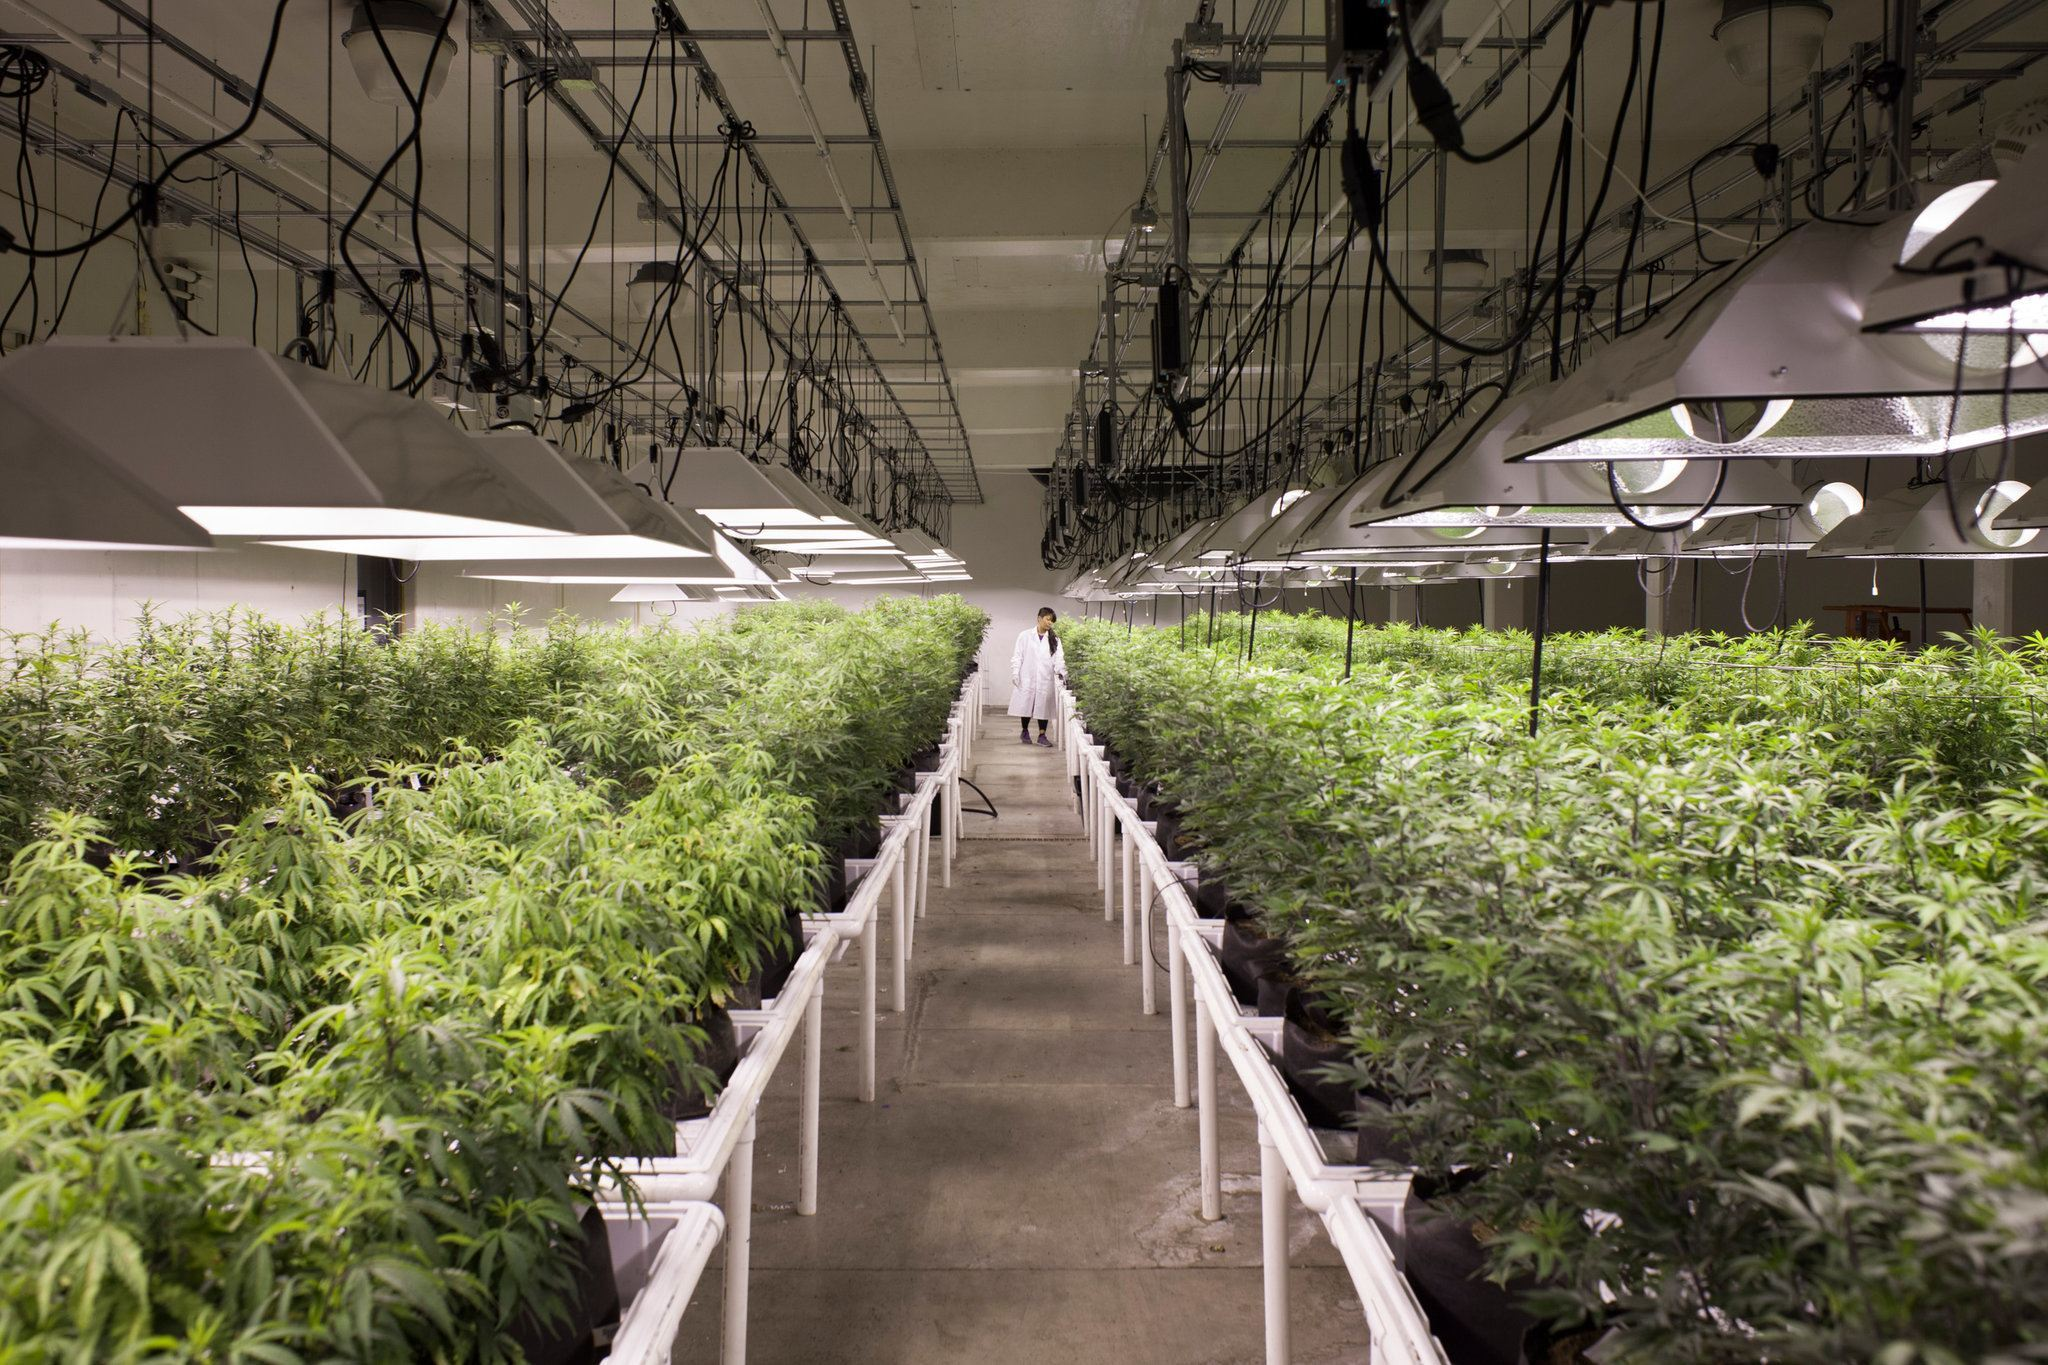 Image of an indoor legal medical marijuana grow in Washington State.